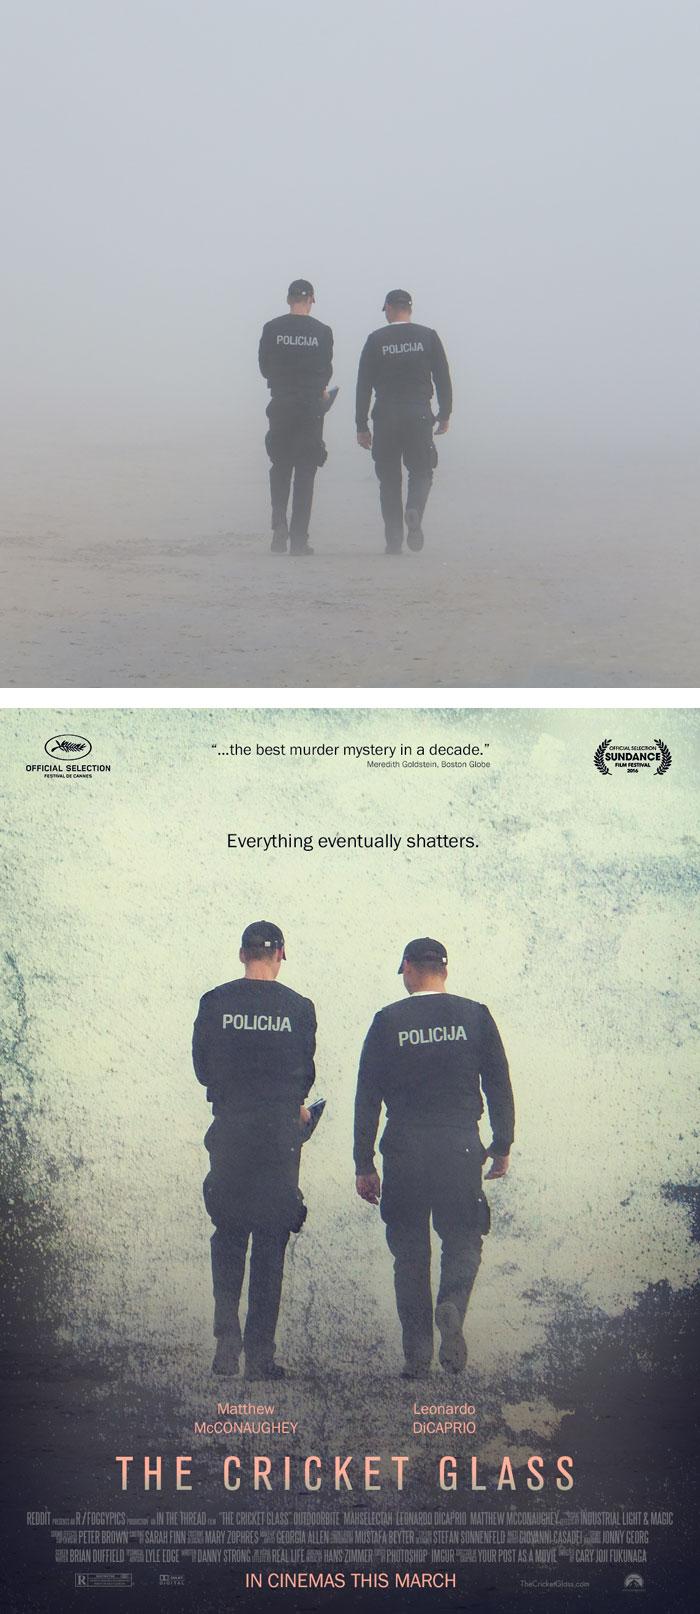 random-photos-turned-into-movie-posters-112__700